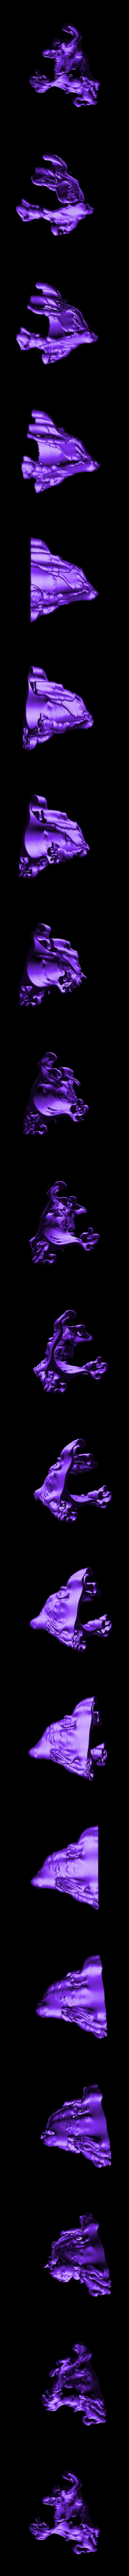 cave3.stl Download free STL file Weird terrain collection • 3D printer object, ferjerez3d